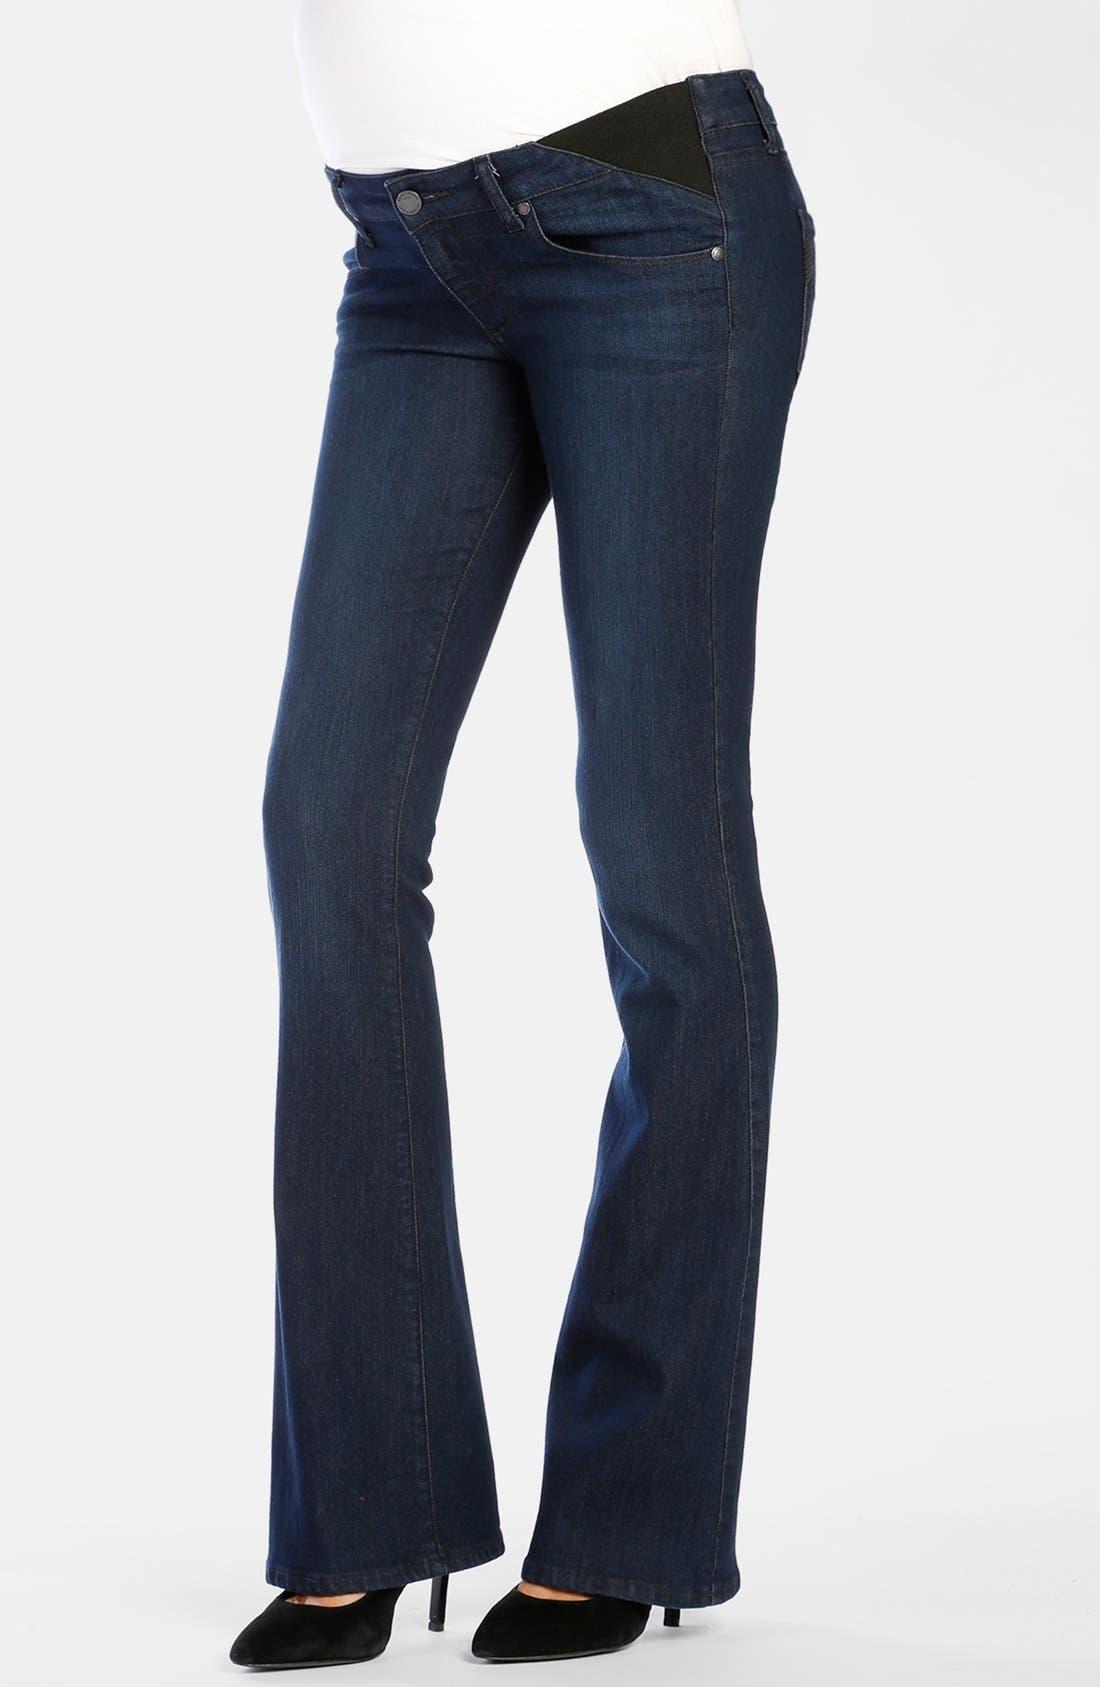 Alternate Image 1 Selected - Paige Denim 'Skyline' Bootcut Maternity Jeans (Alexis)